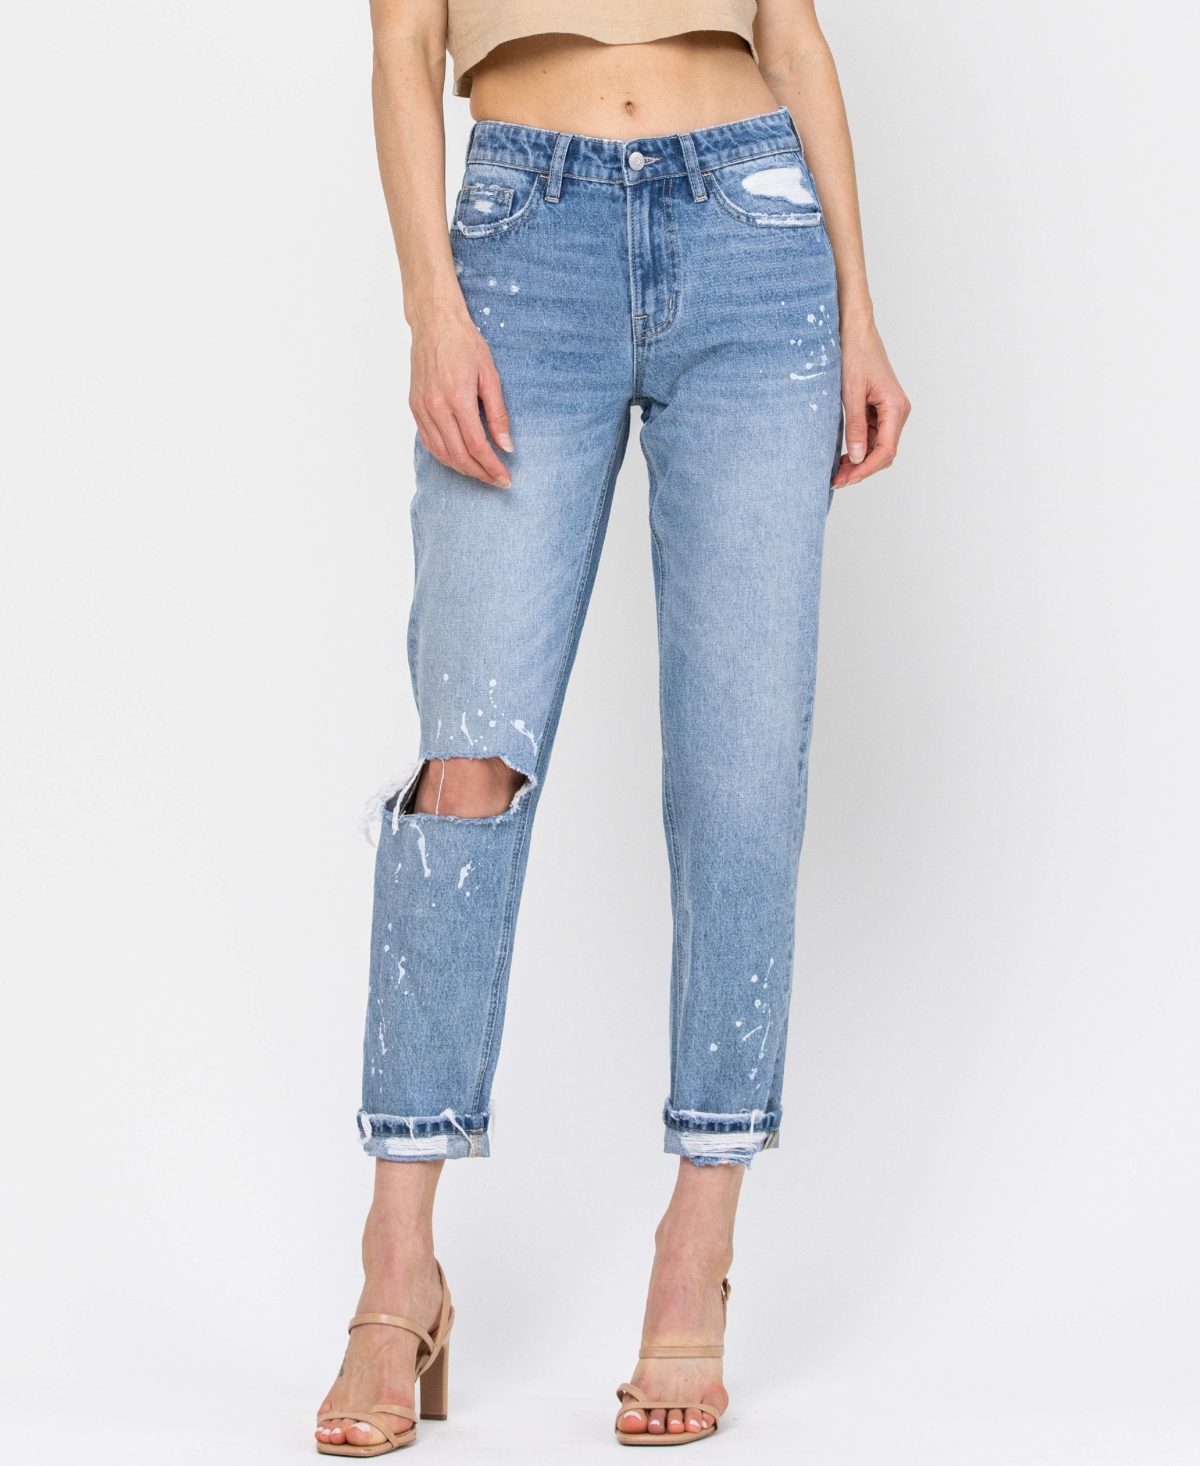 Women's Distressed Boyfriend Crop with Paint Splatter Detail and Single Cuff Jeans